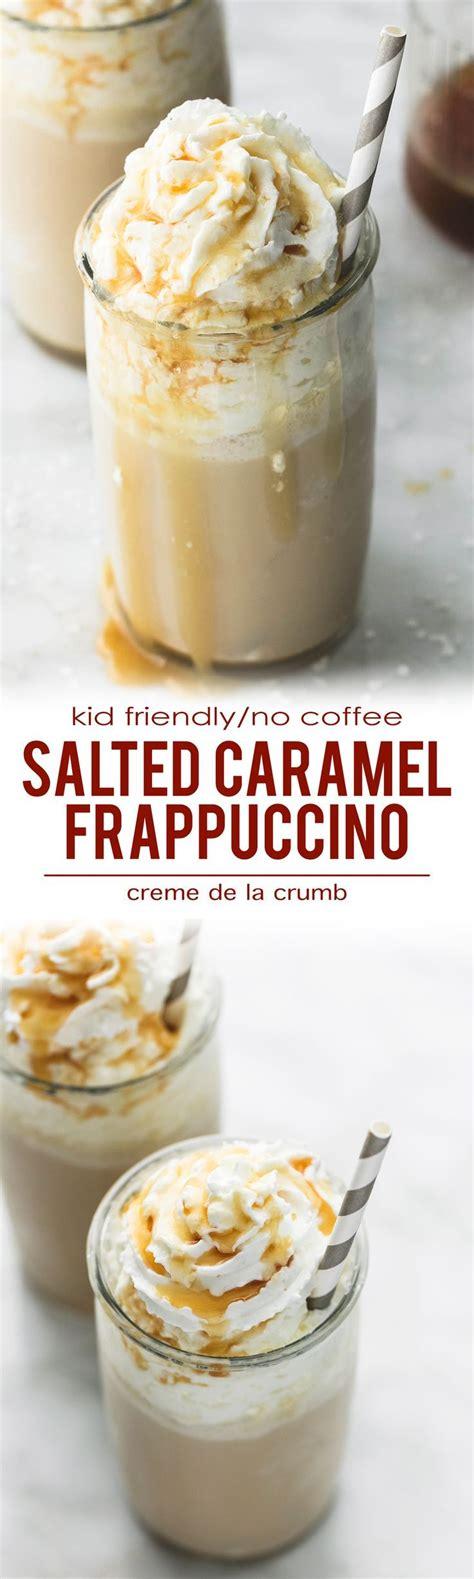 So you can make a coffee frappuccino or a crème frappuccino. Quick and easy, creamy Salted Caramel Frappuccino (Kid Friendly/No Coffee) | lecremedelacrumb ...